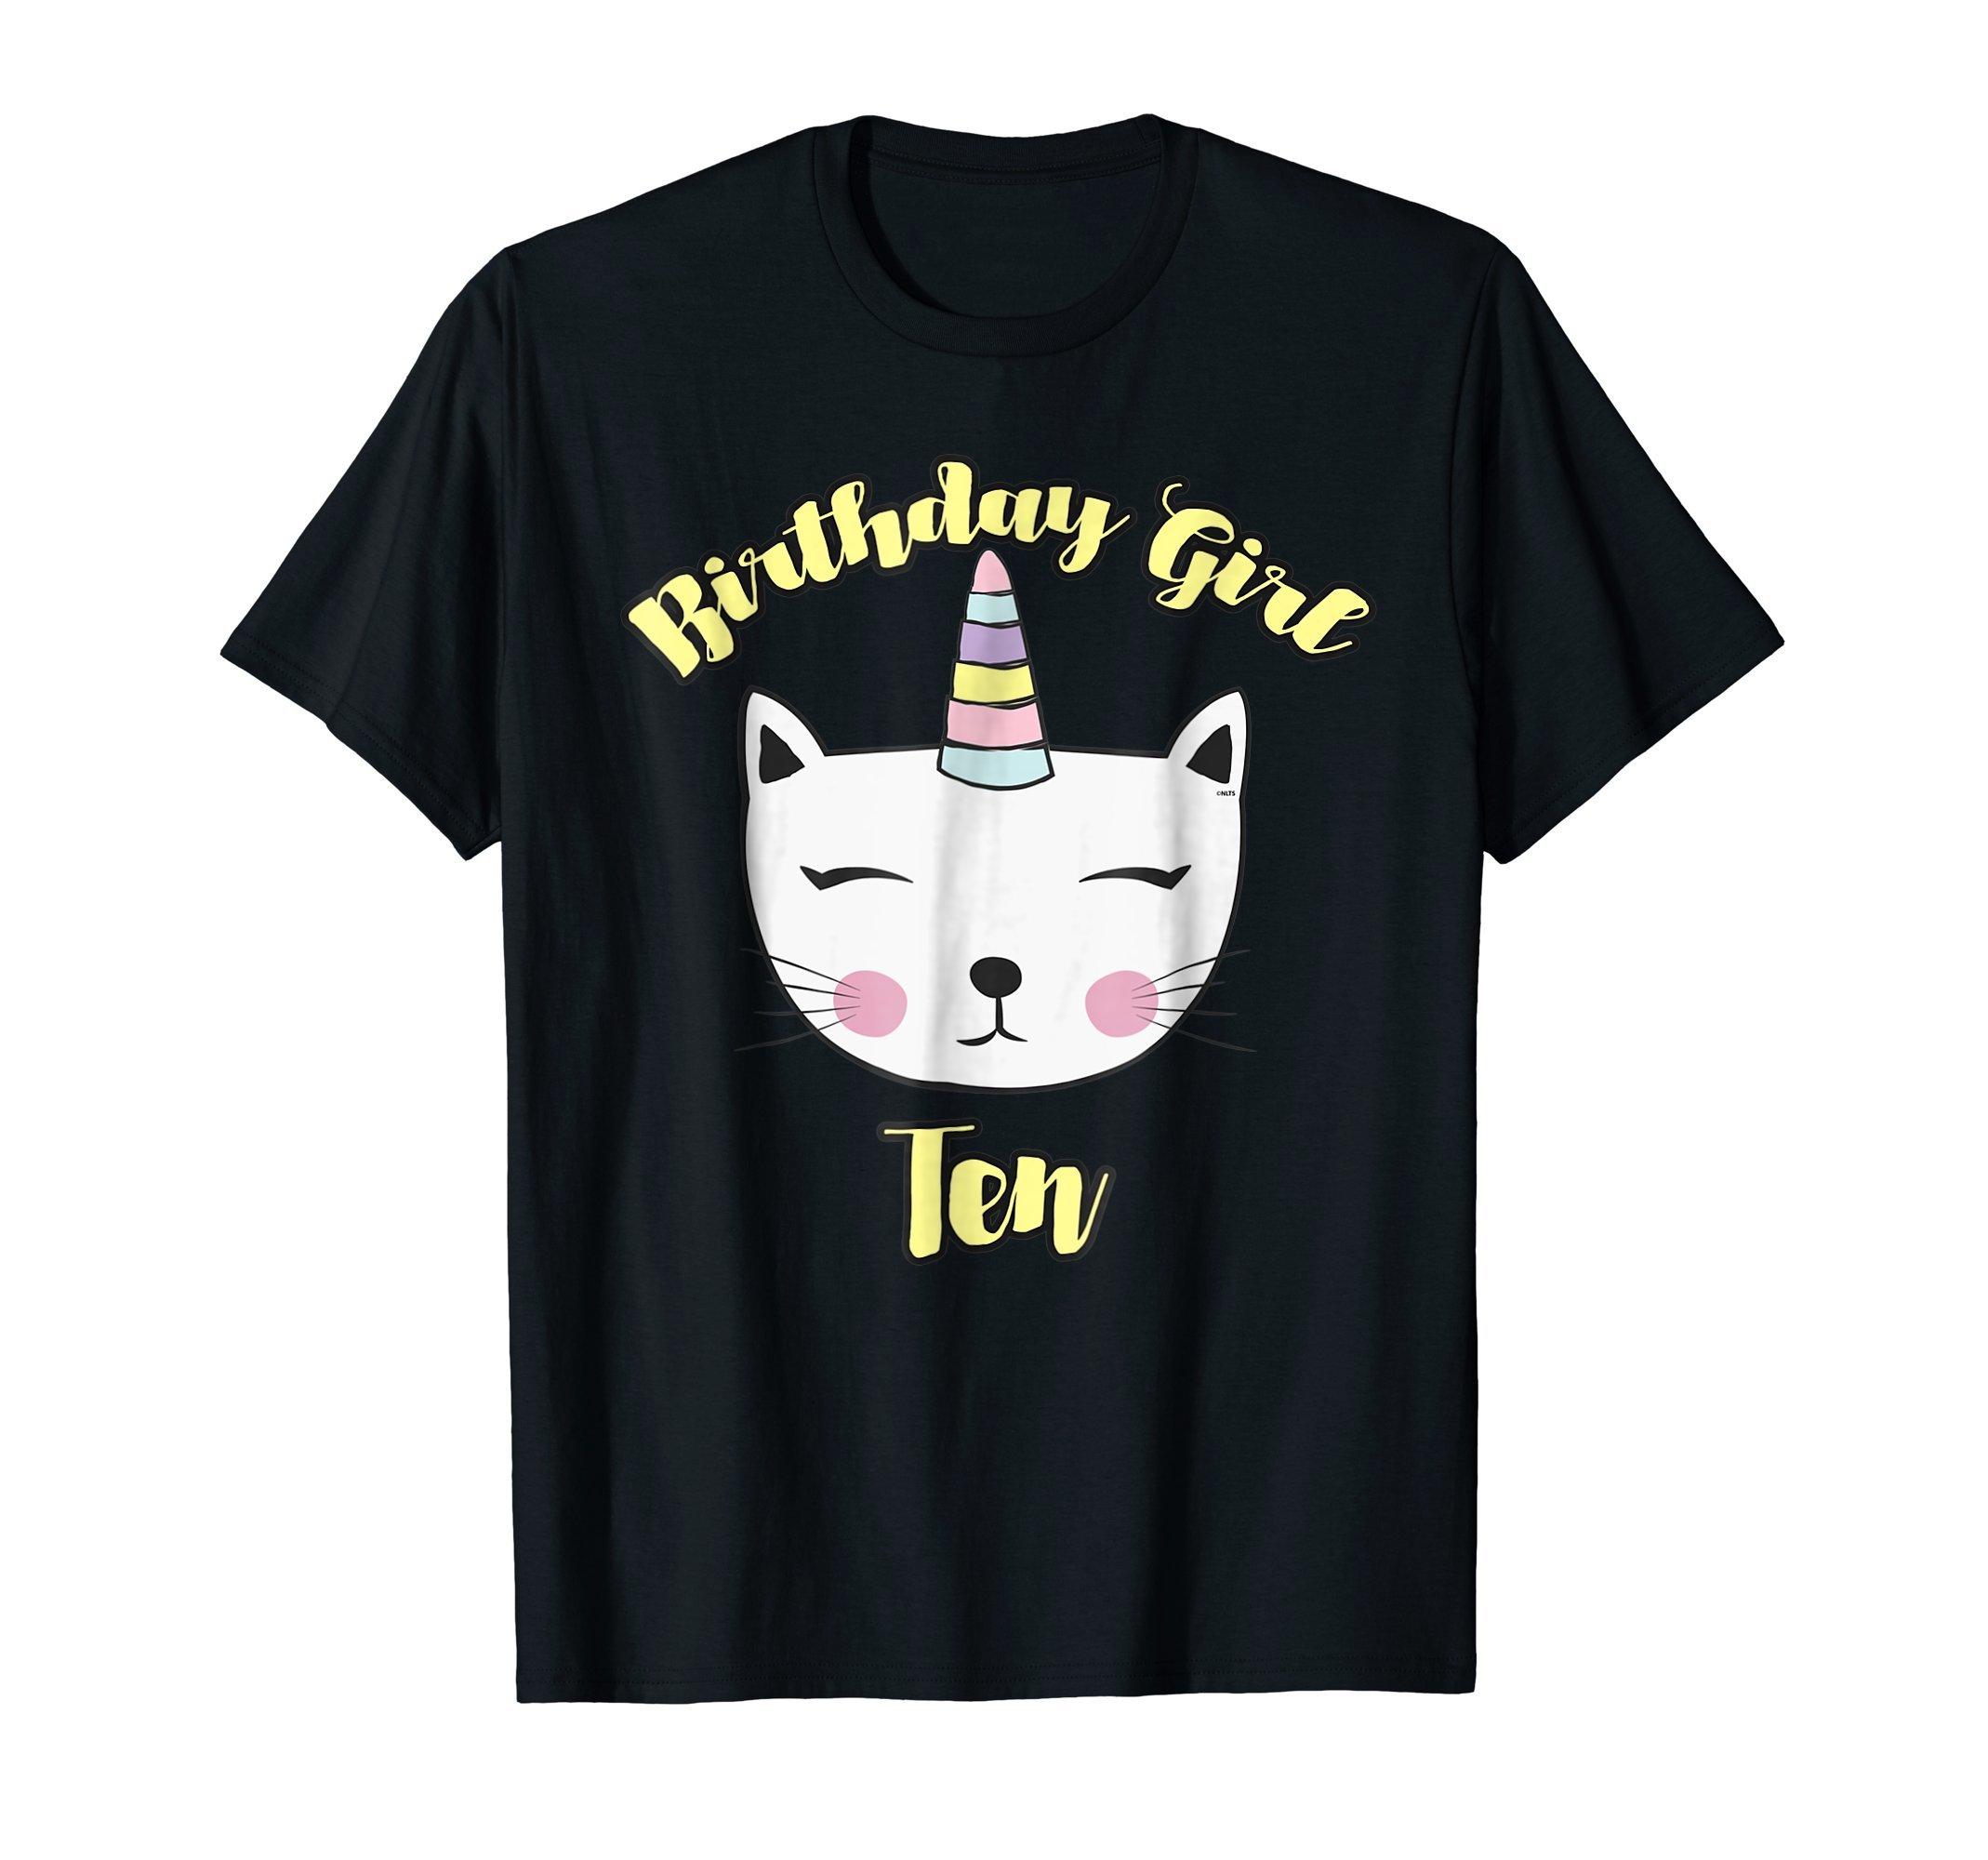 Caticorn-Birthday-Girl-for-10th-Birthday-T-Shirts-Shirts-Tee